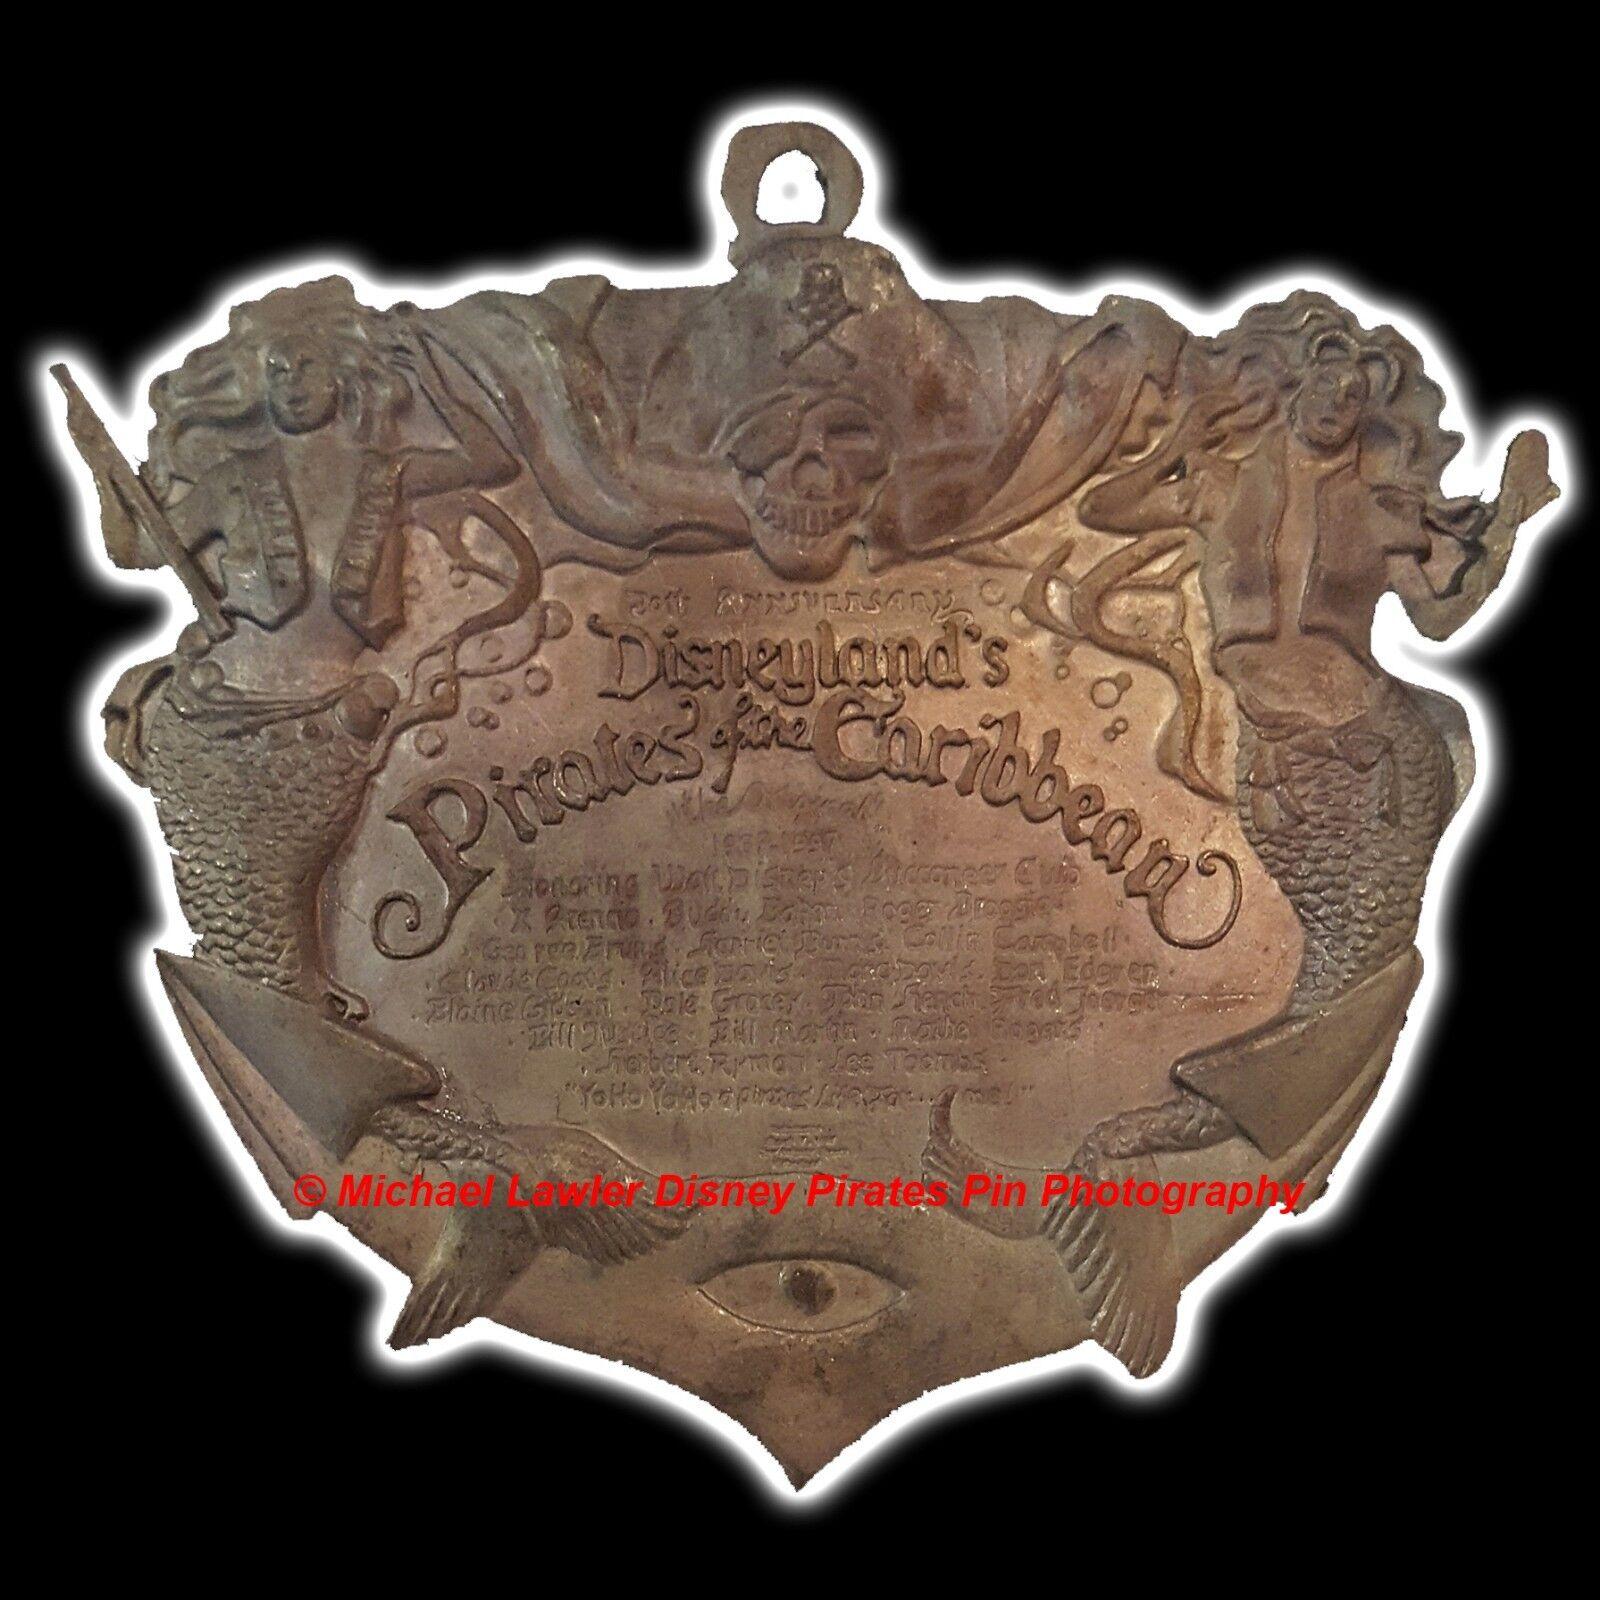 Contemporary 1968 now disneyana collectibles disney disneylands pirates of the caribbean plaque box pin reviewsmspy